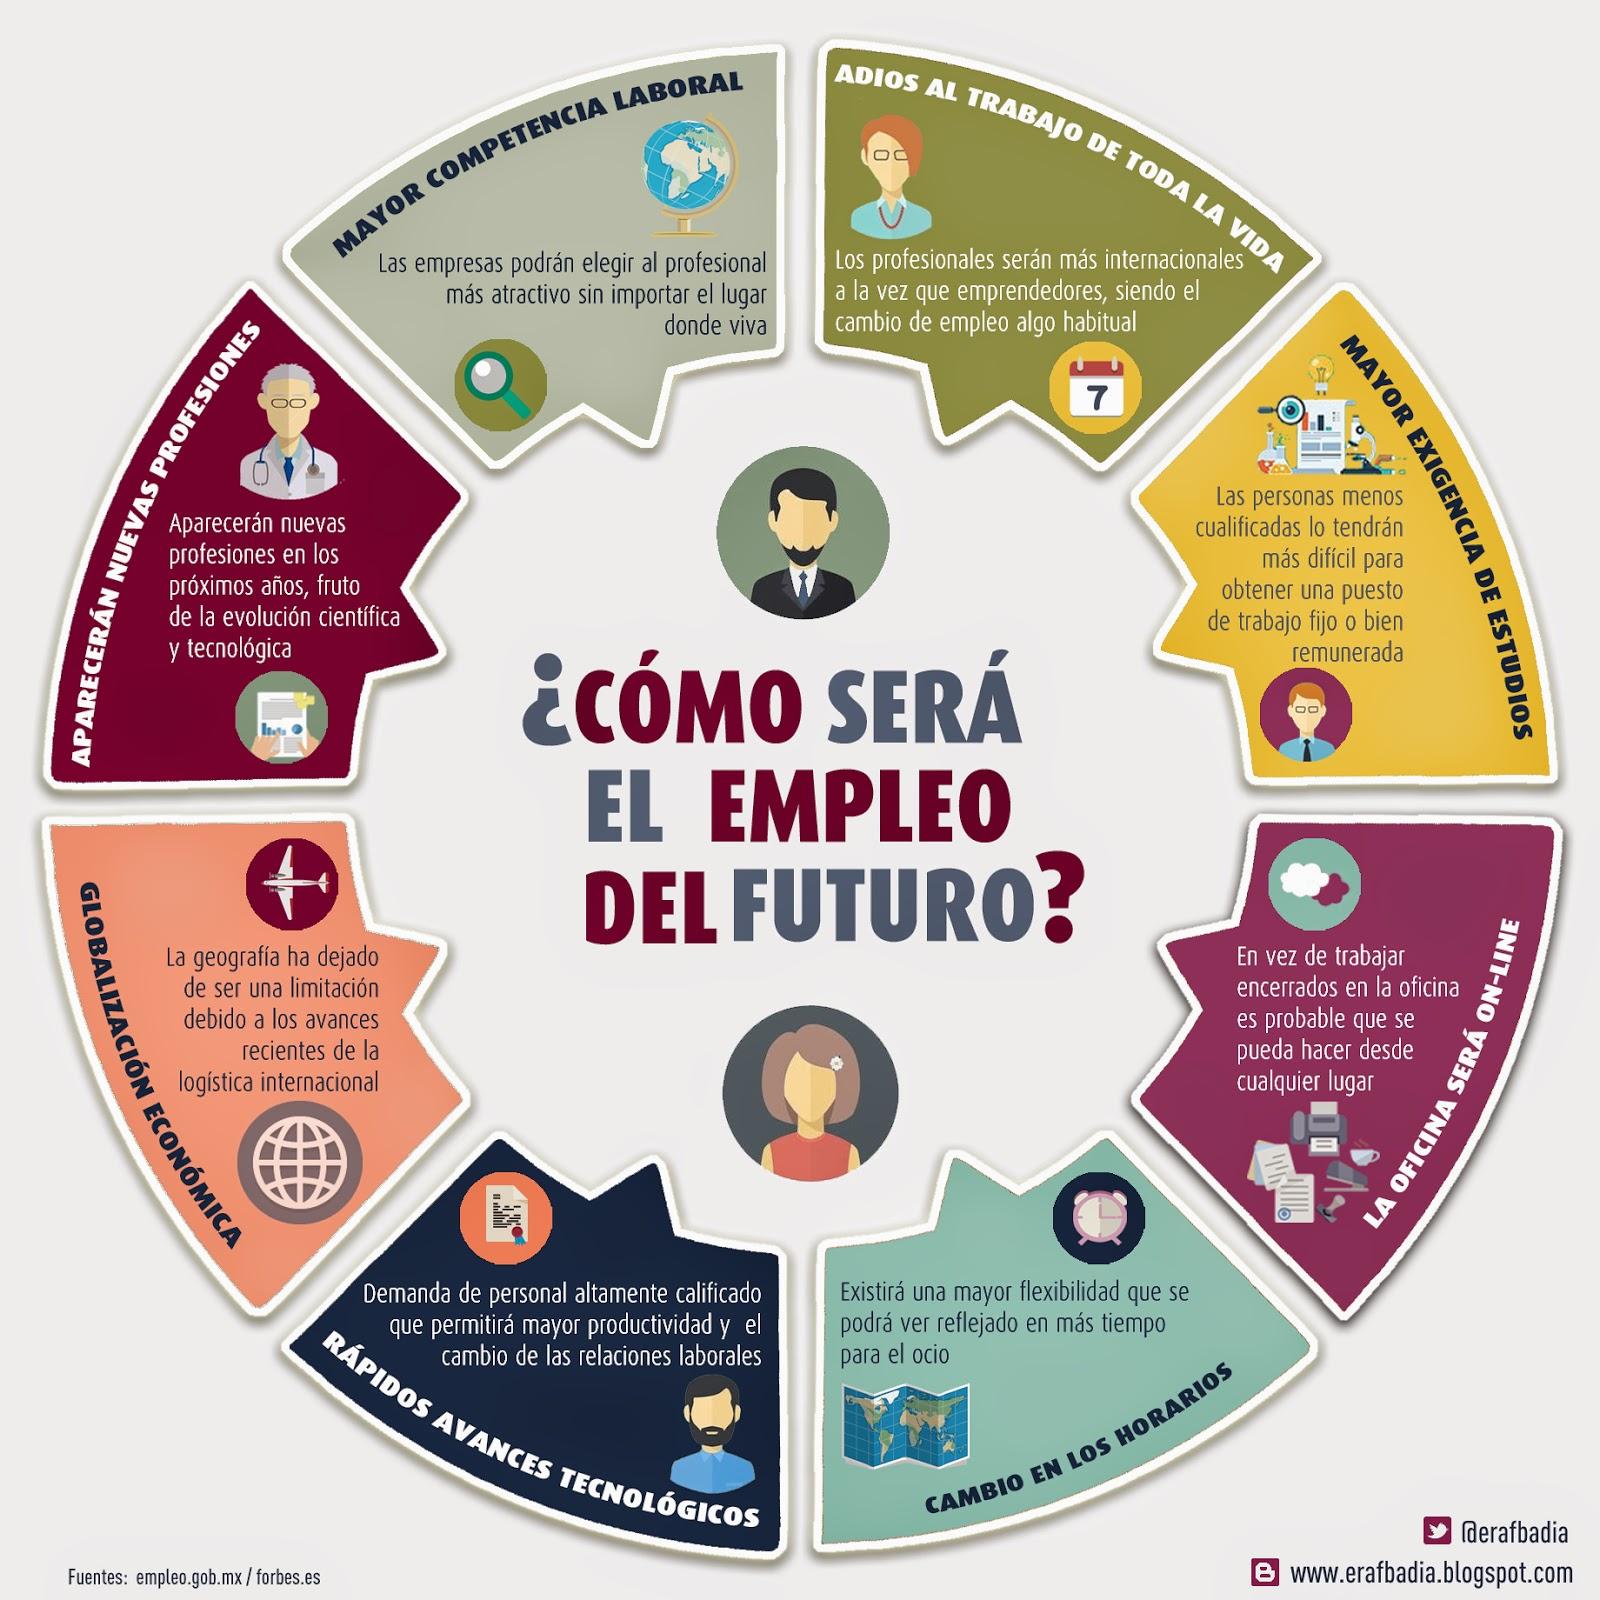 C mo ser el trabajo del futuro infografia infographic for Oficina de empleo mostoles